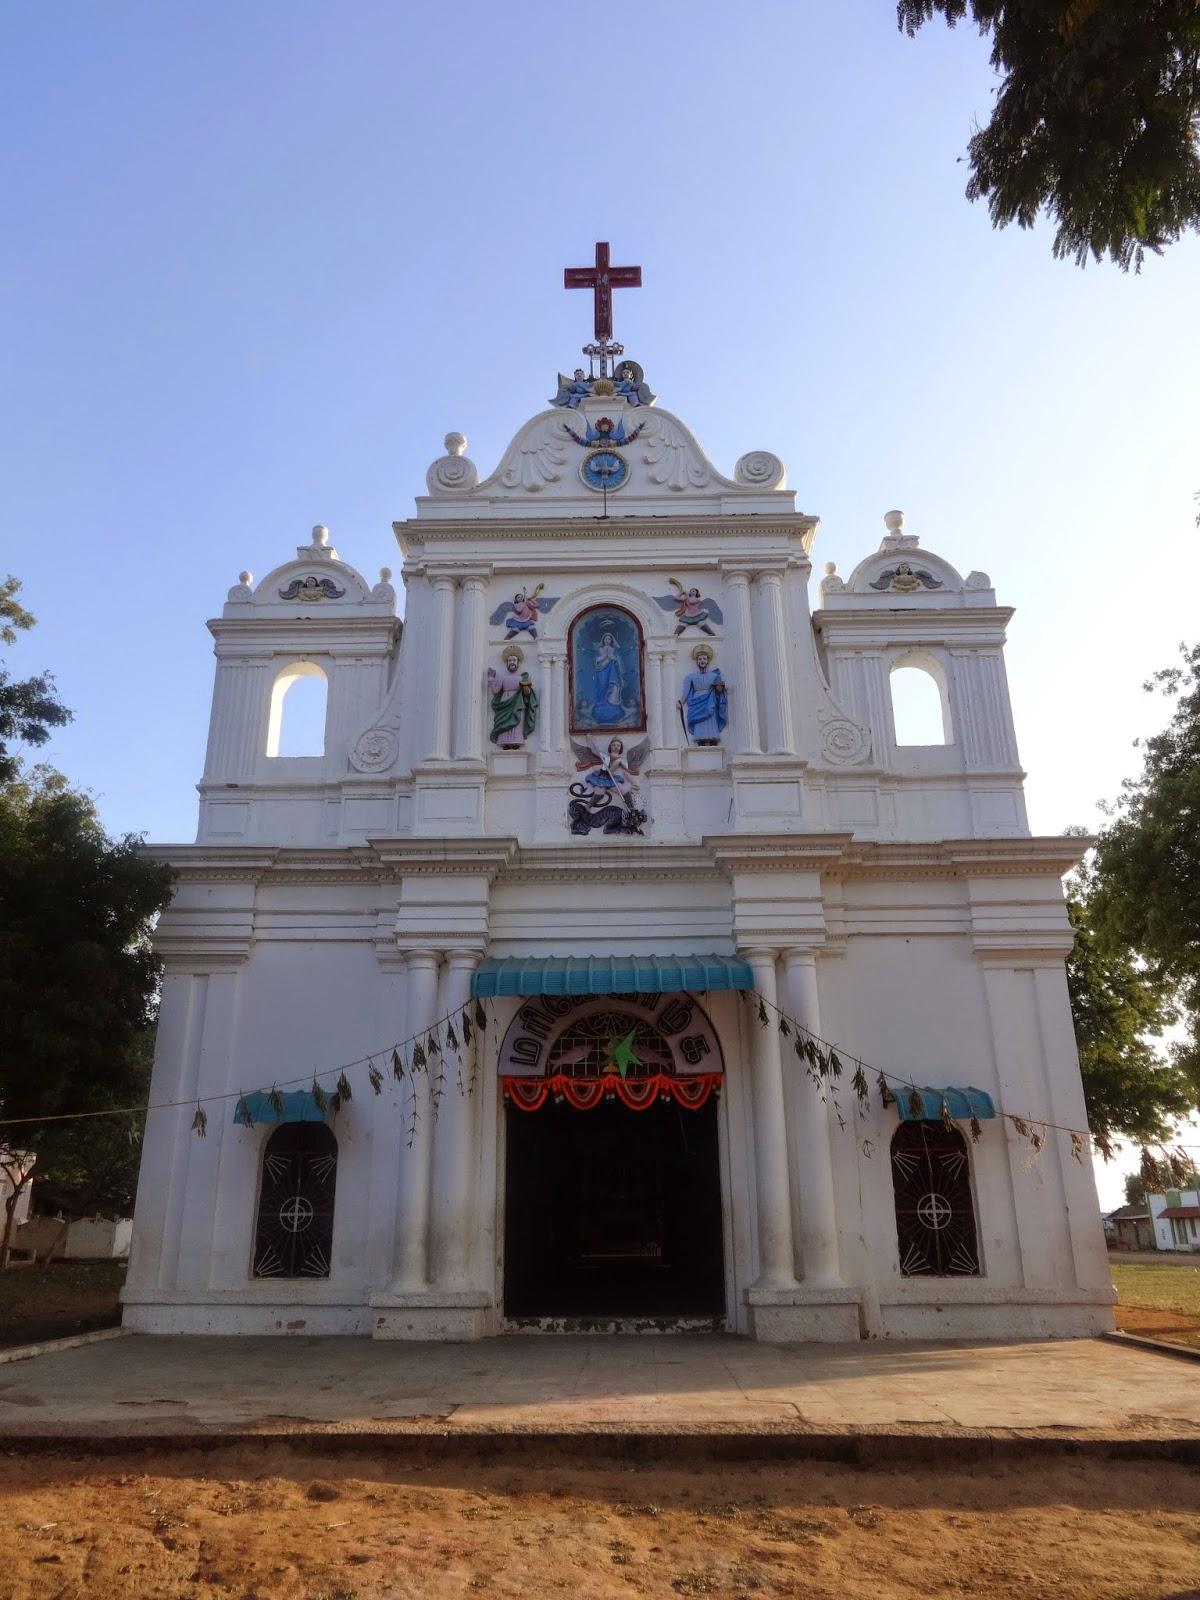 Tamilnadu Tourism Avur Church Pudukottai